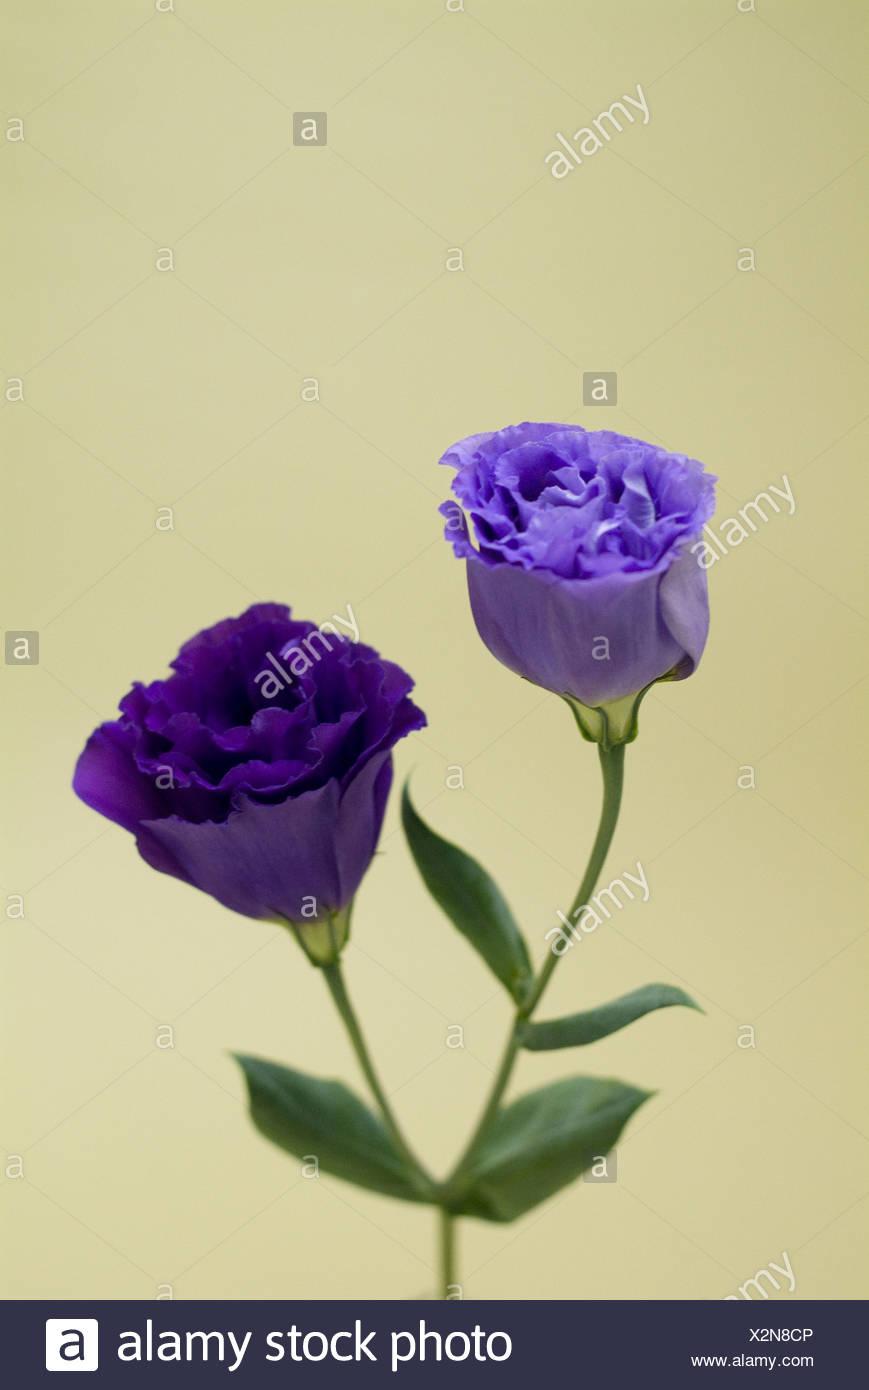 Eustoma grandiflorum - Stock Image